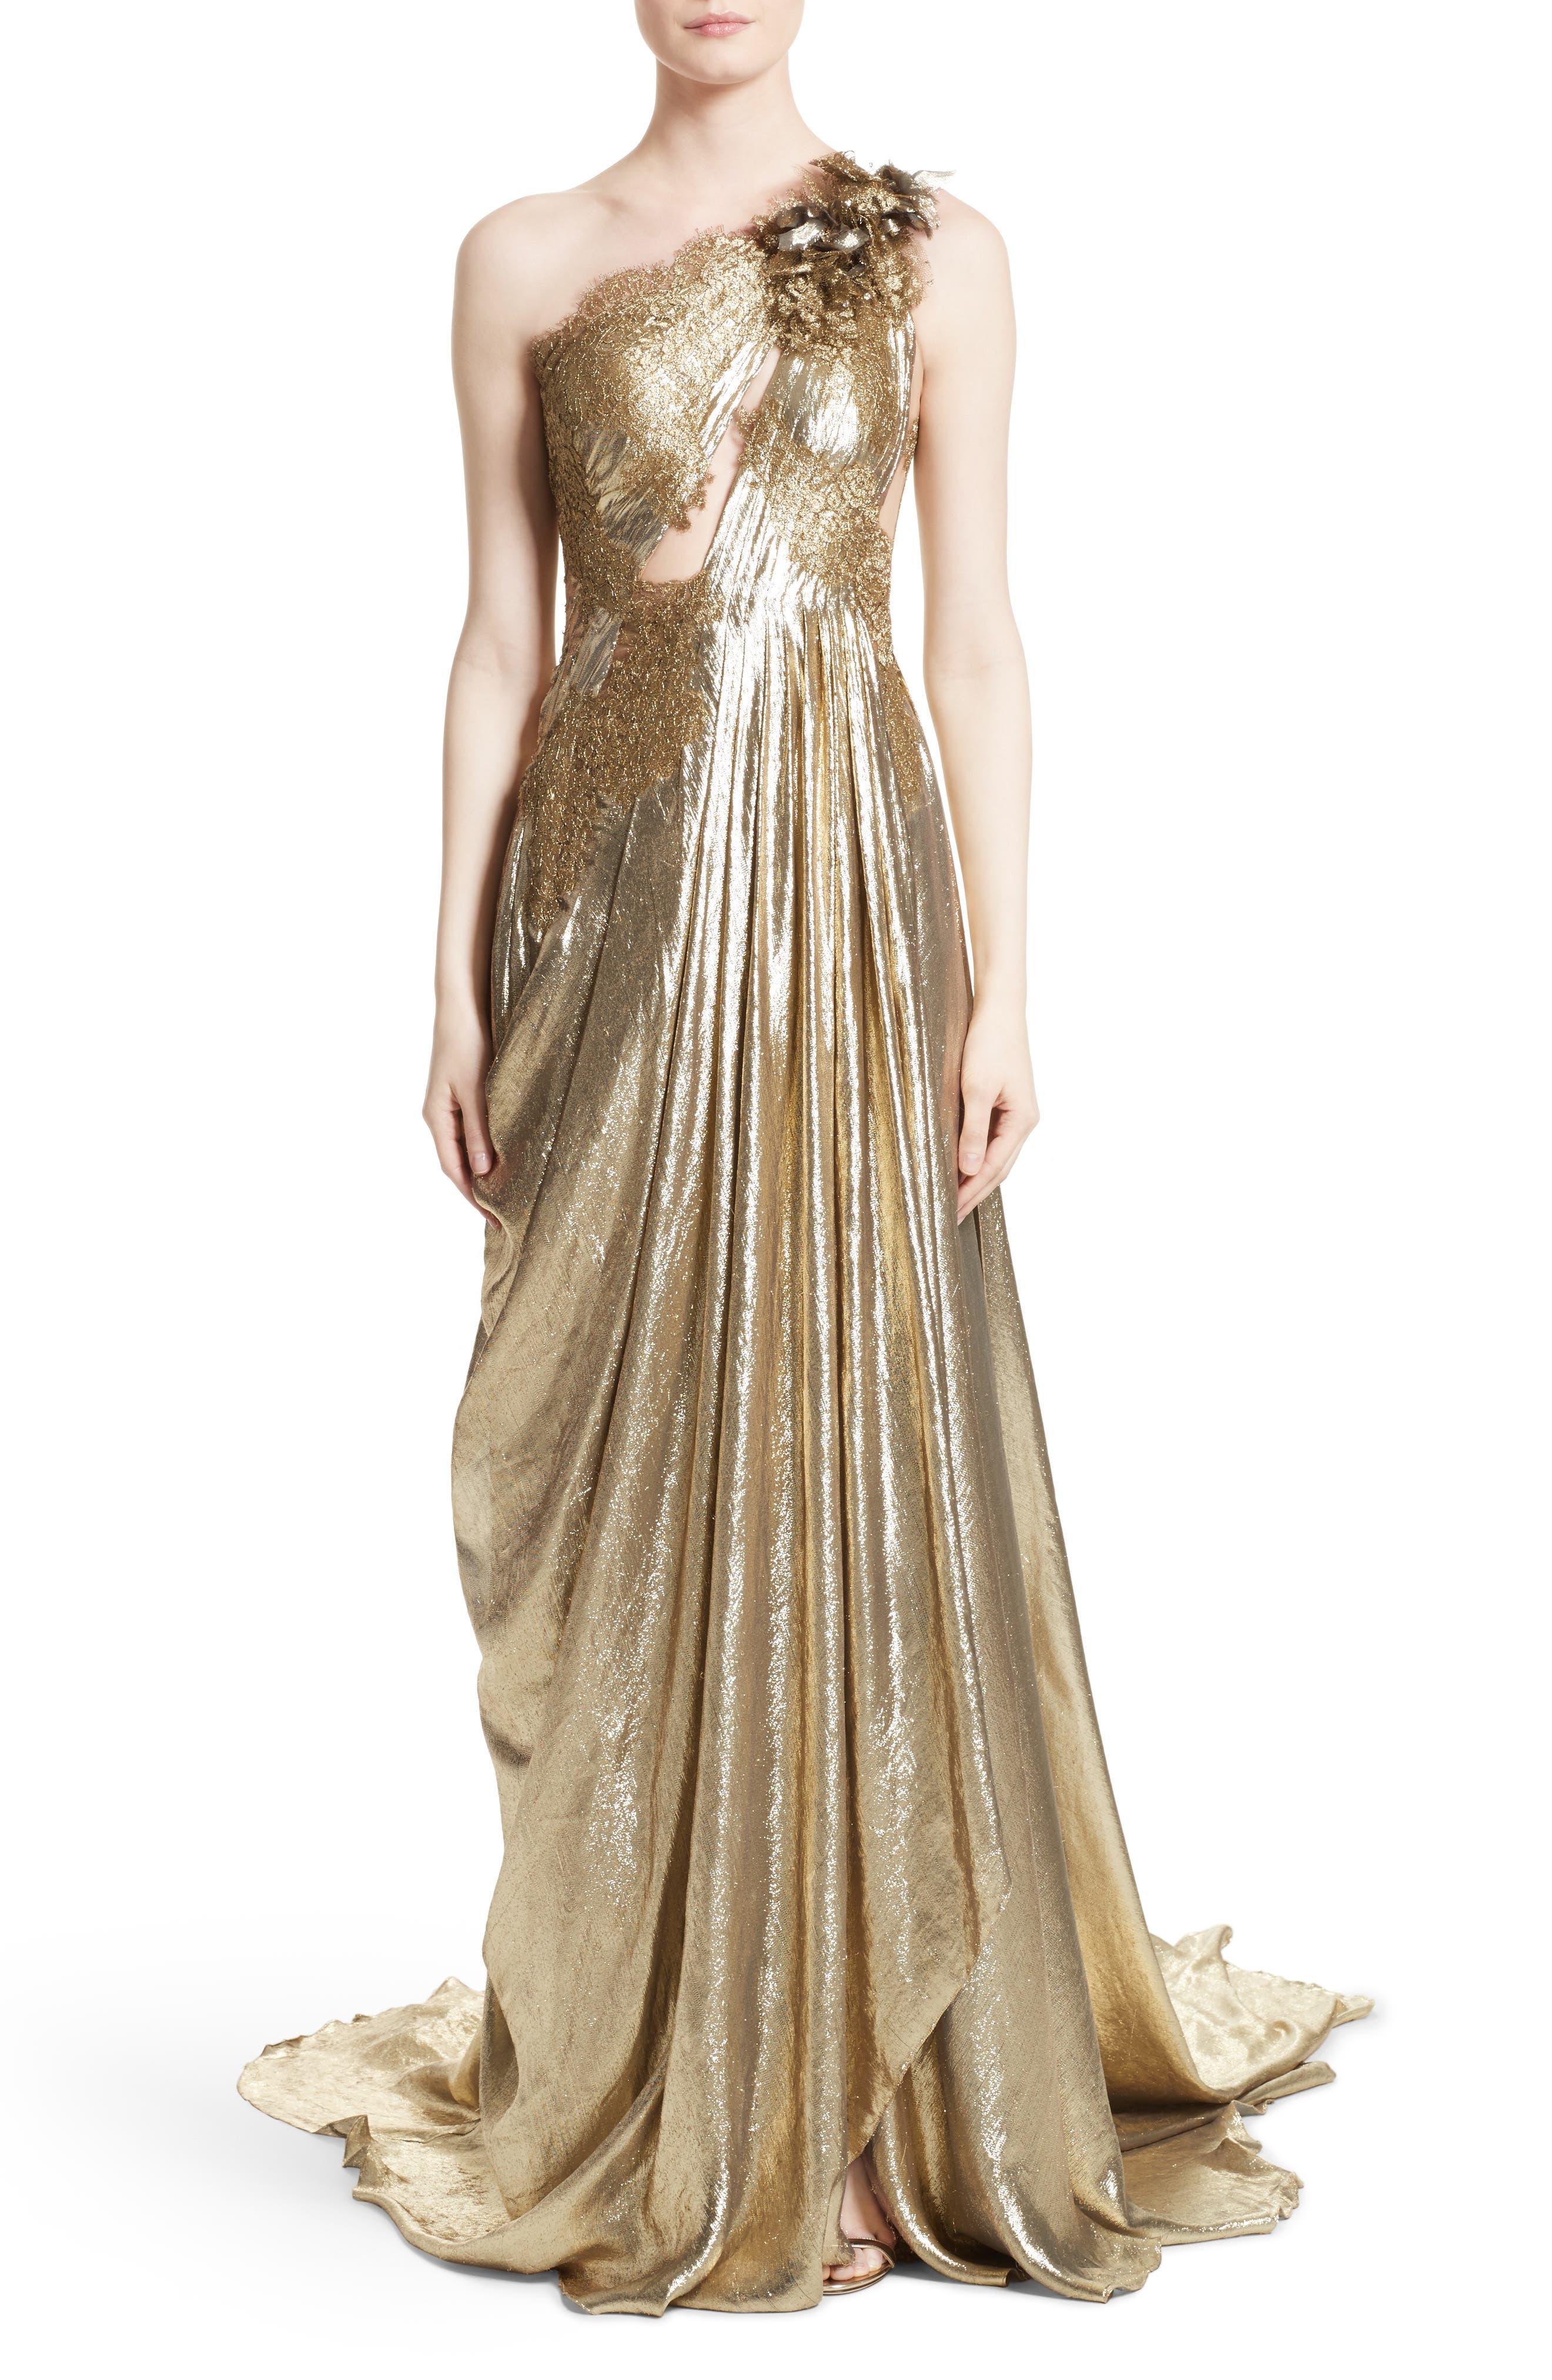 Alternate Image 1 Selected - Marchesa Metallic Lace & Lamé One-Shoulder Gown